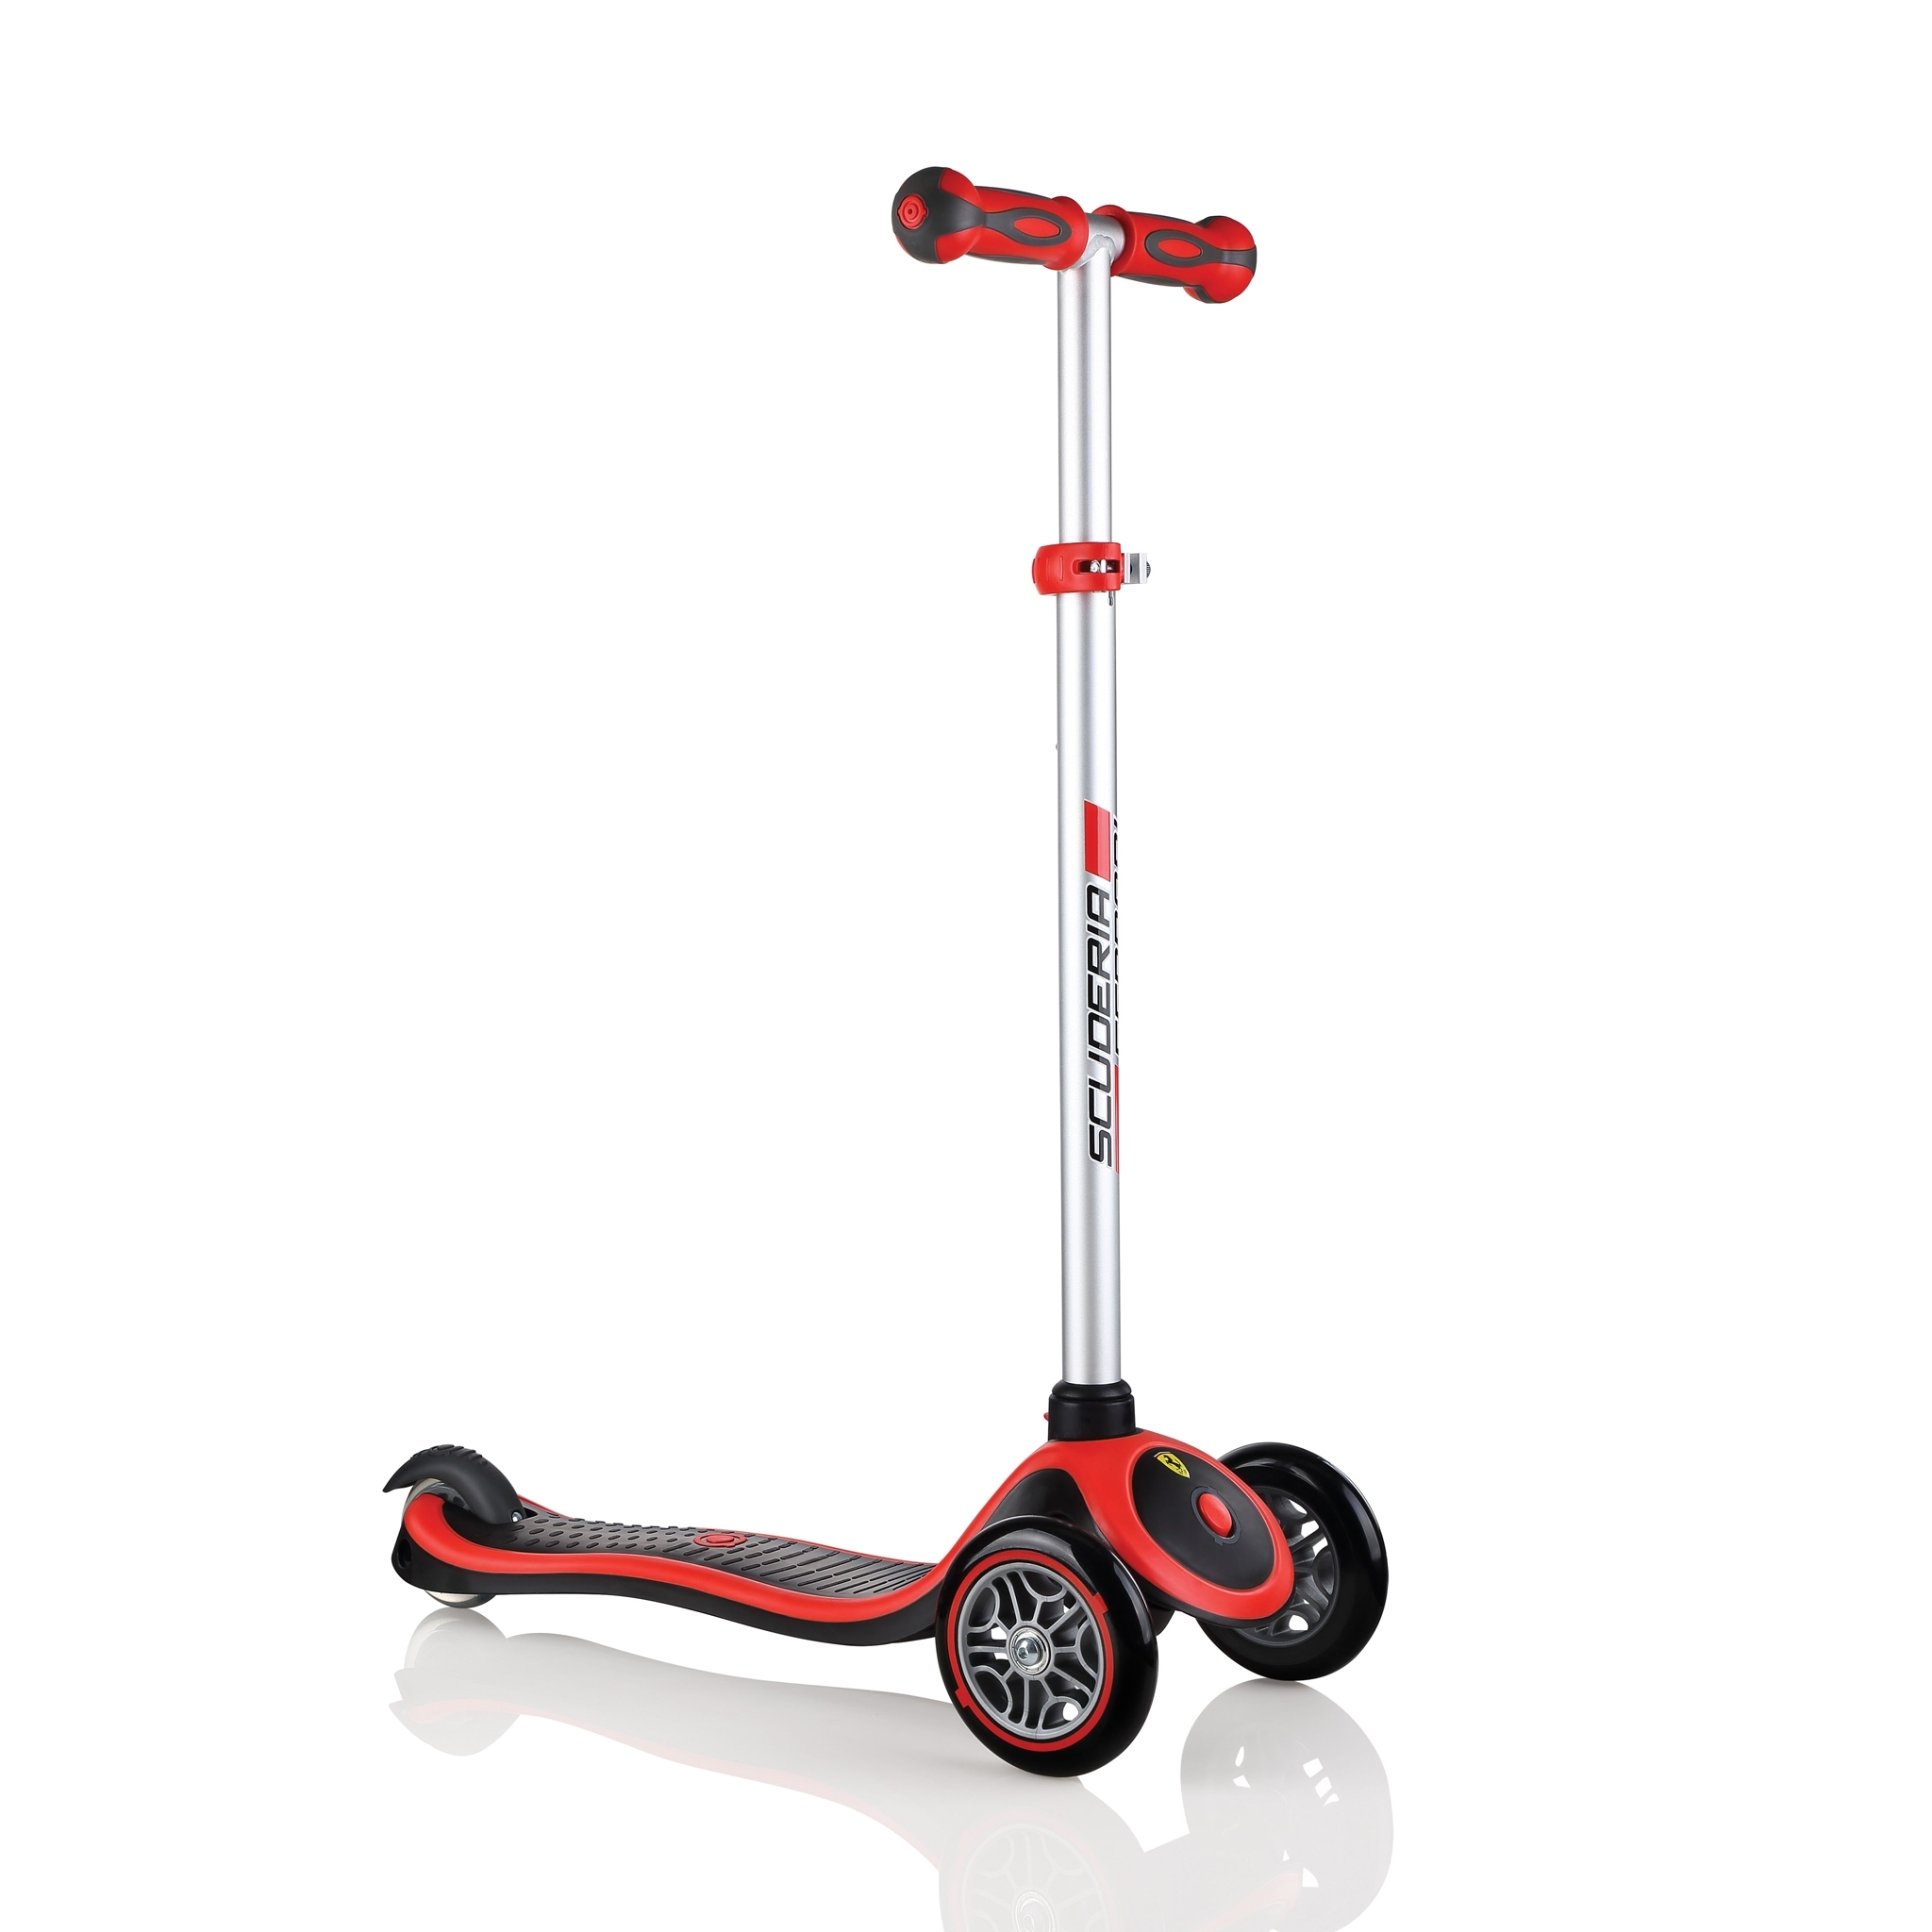 ferrari 3 wheel scooter - Globber PRIMO PLUS Ferrari 0